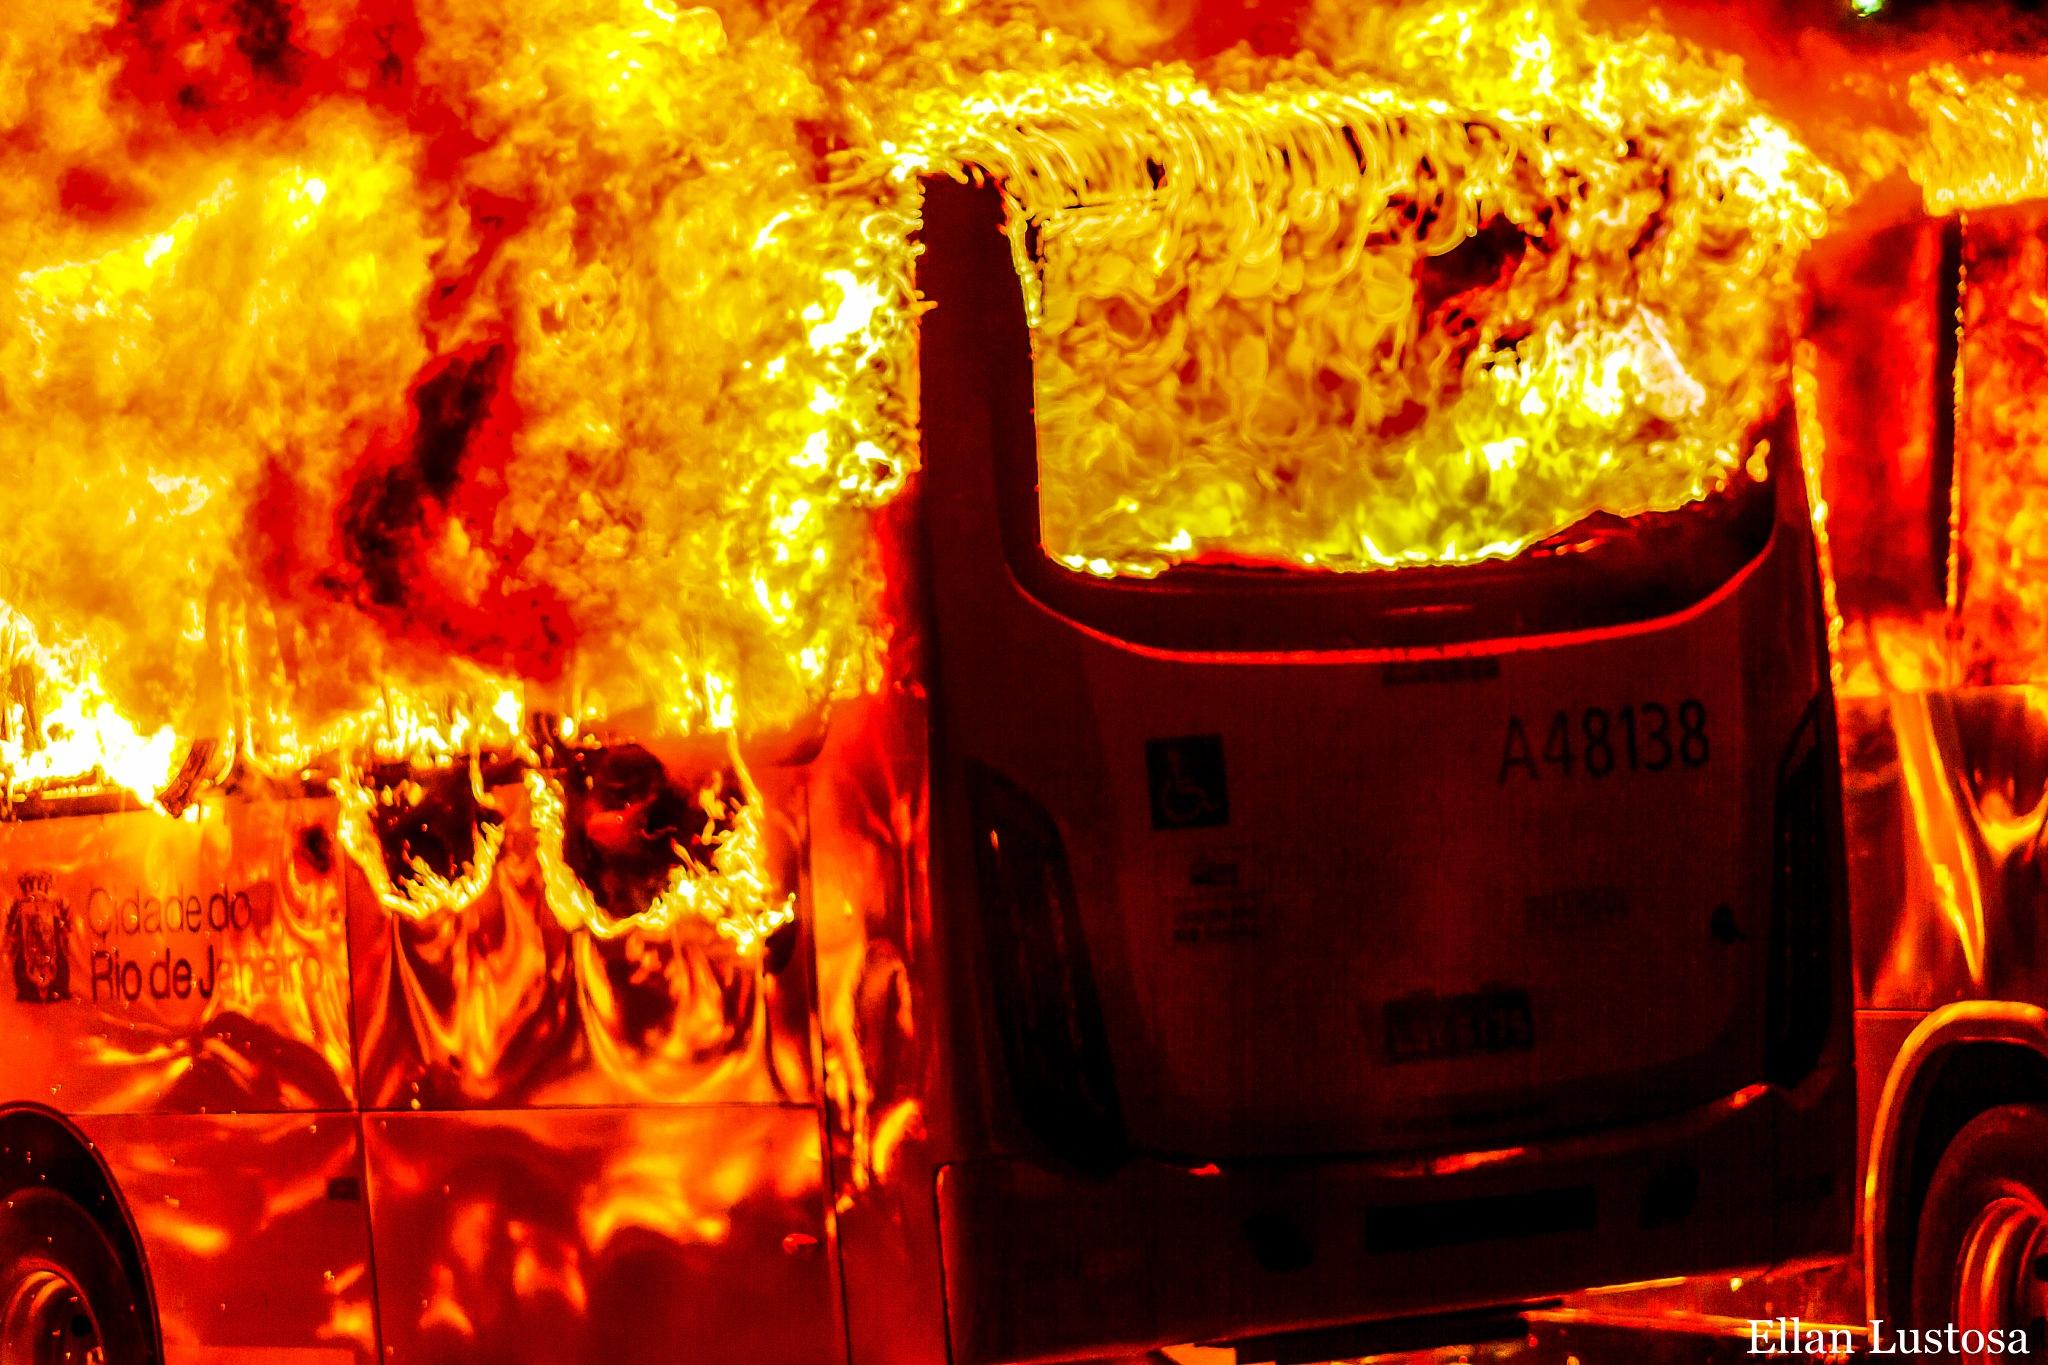 Fire by Ellan Lustosa Photojournalist